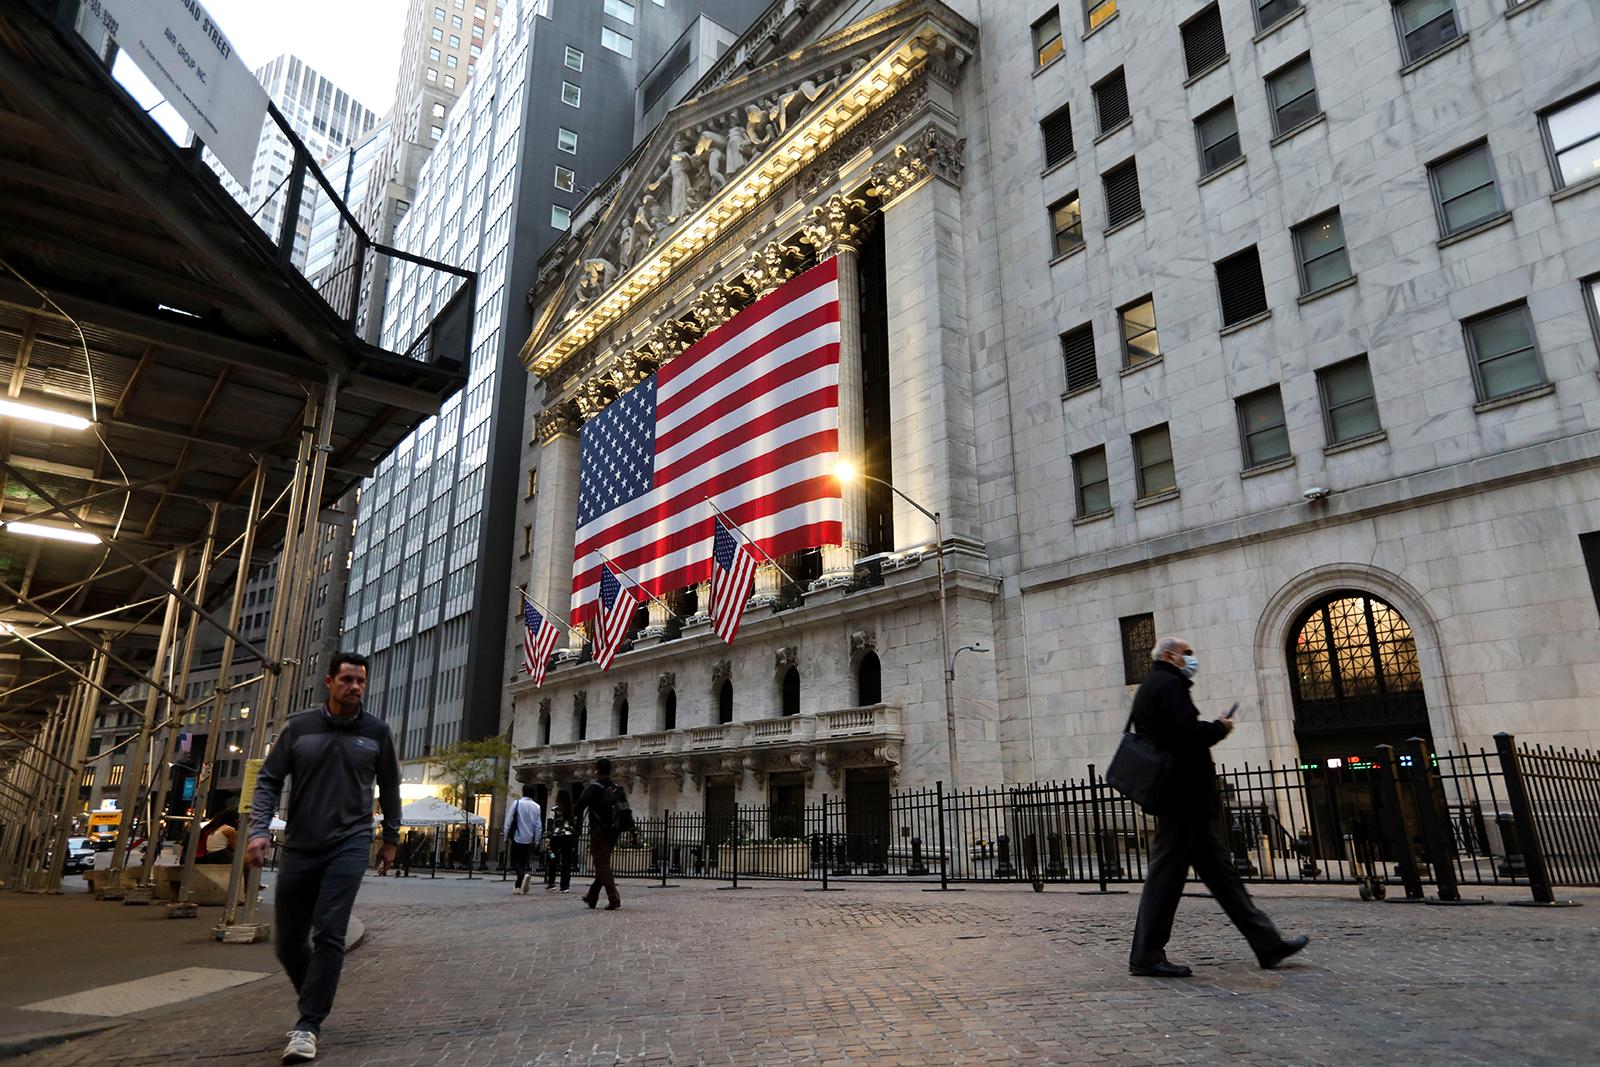 Pedestrians walk past the New York Stock Exchange in New York City, on Monday, November 9